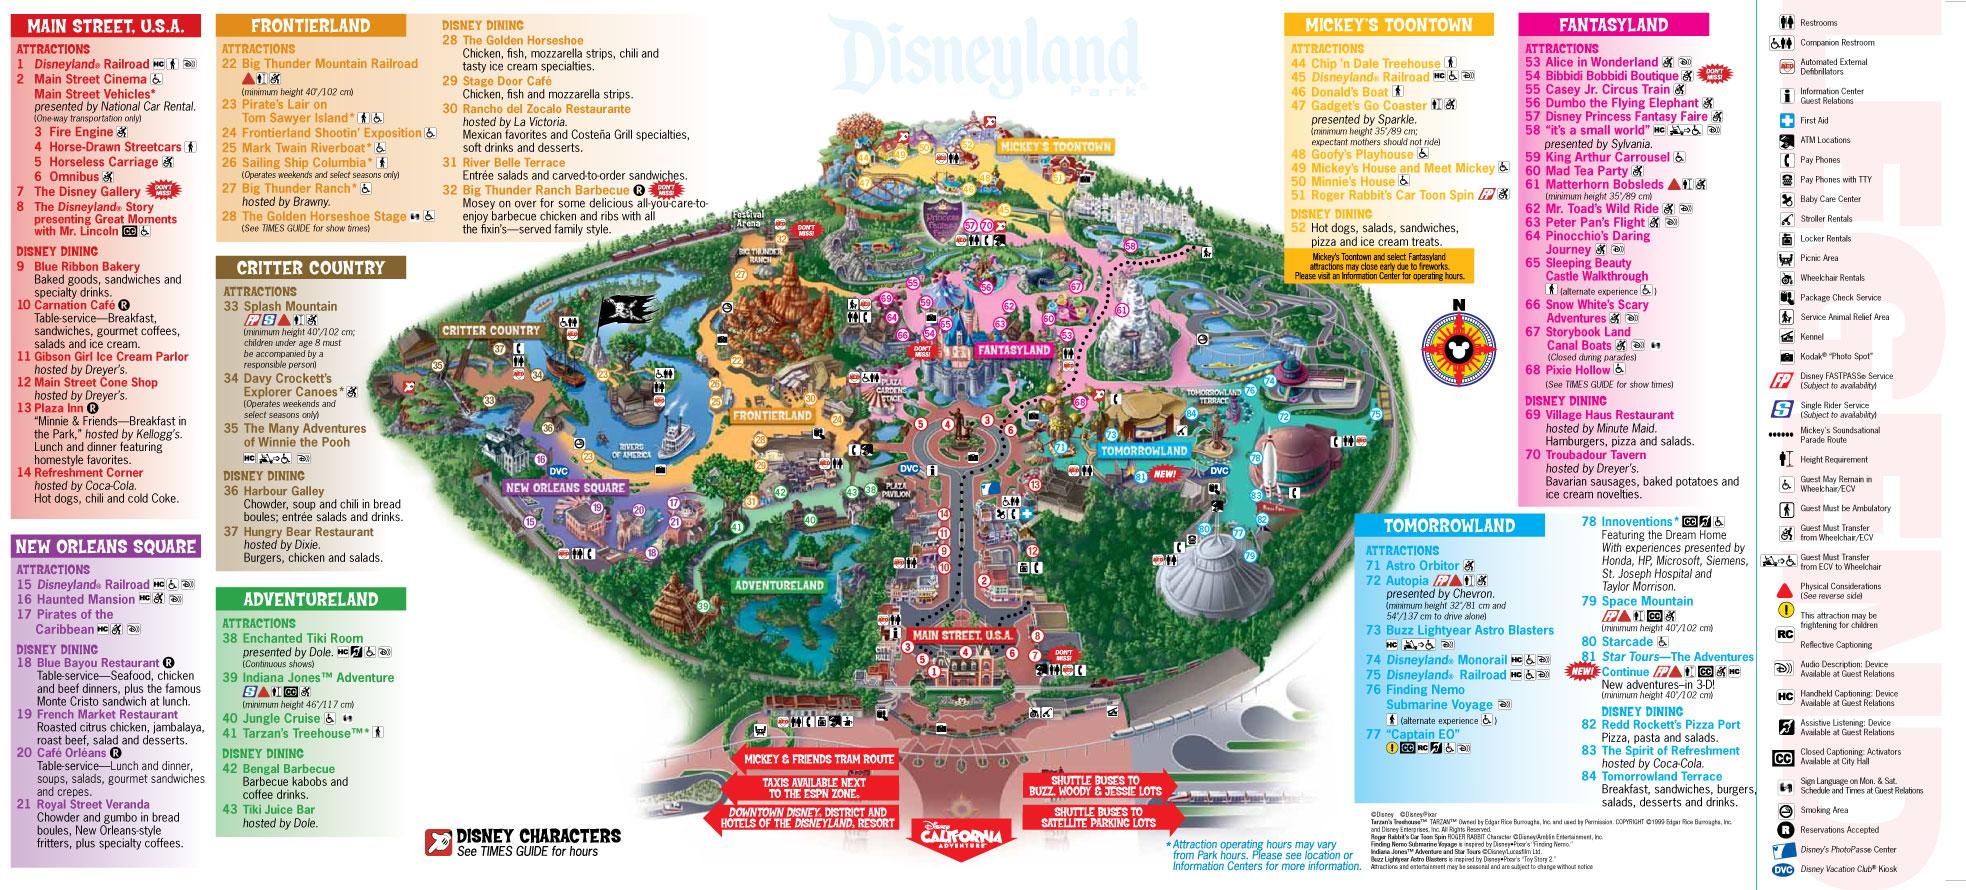 Disney Land Map disneyland map – Arts and Justice Disney Land Map